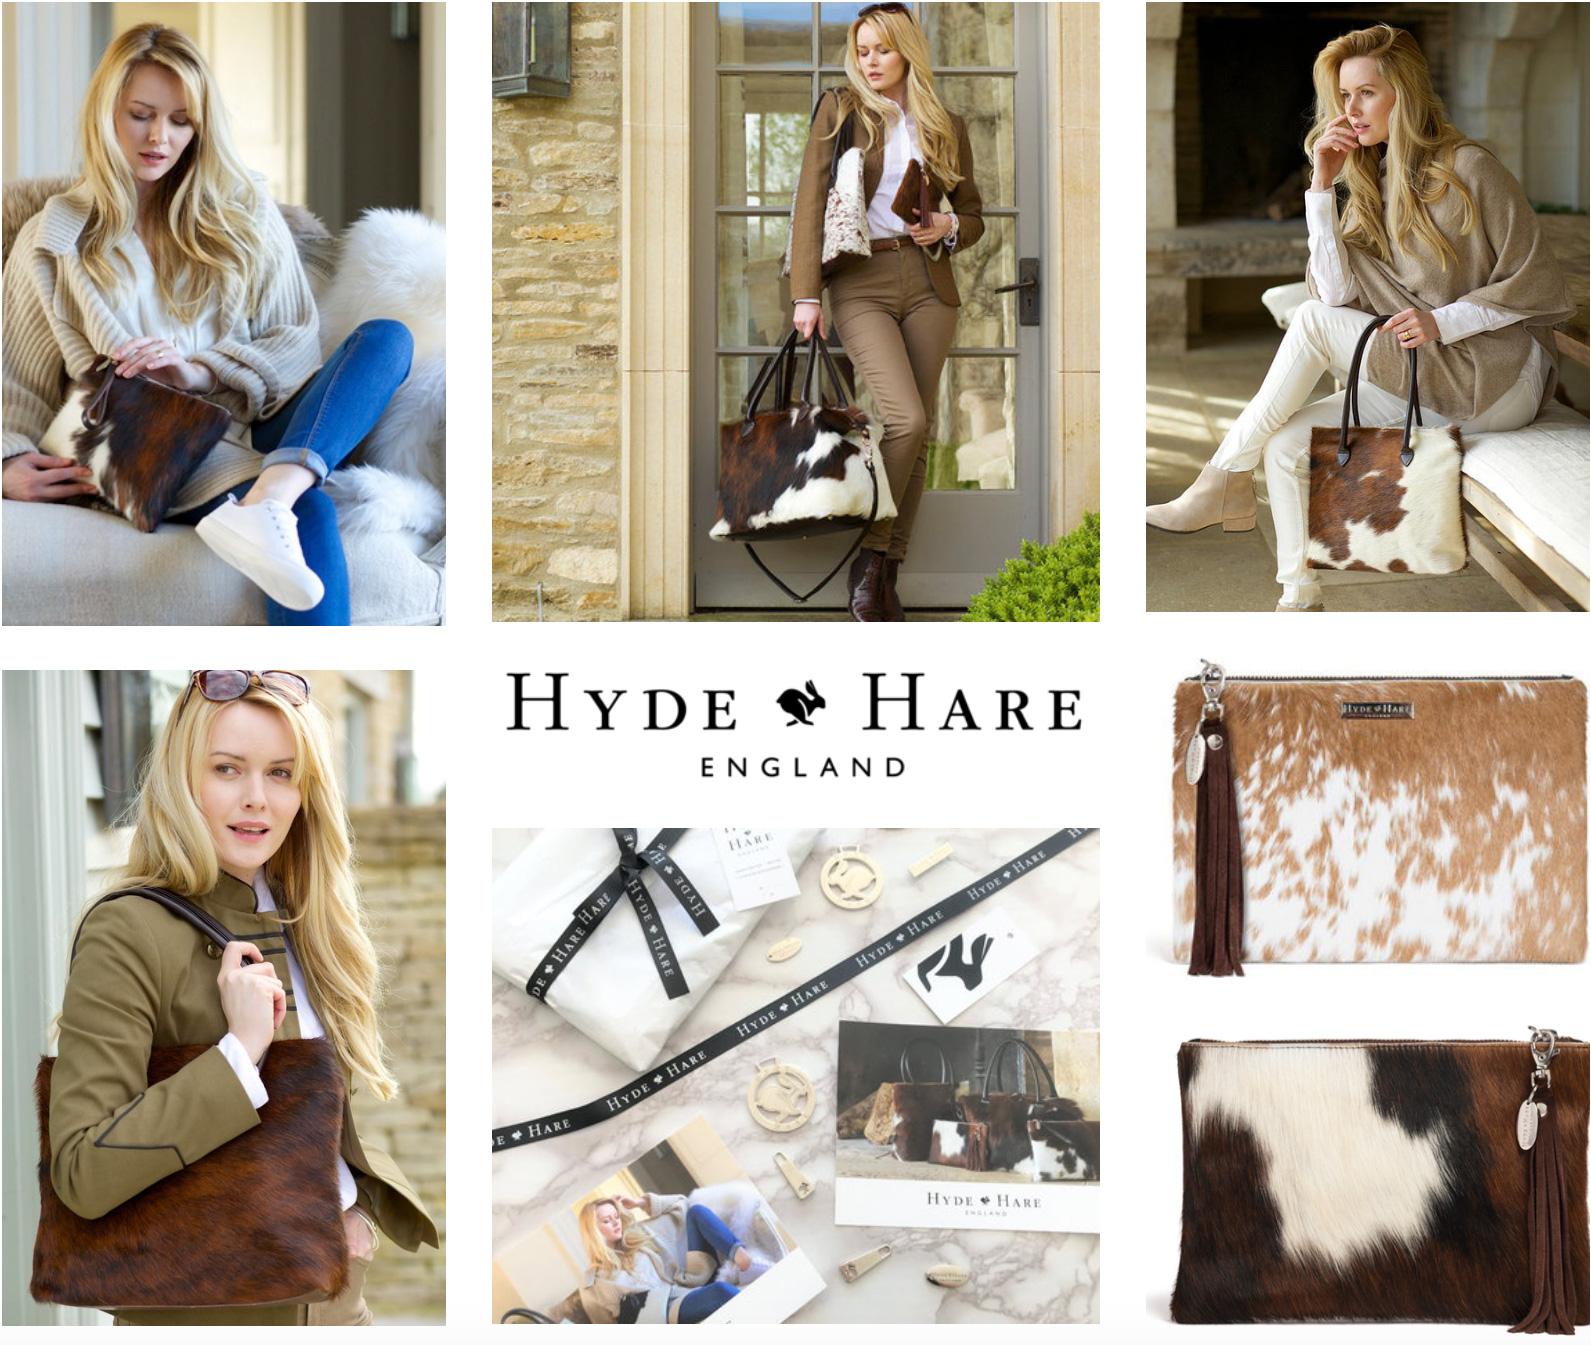 Hyde & Hare case study branding